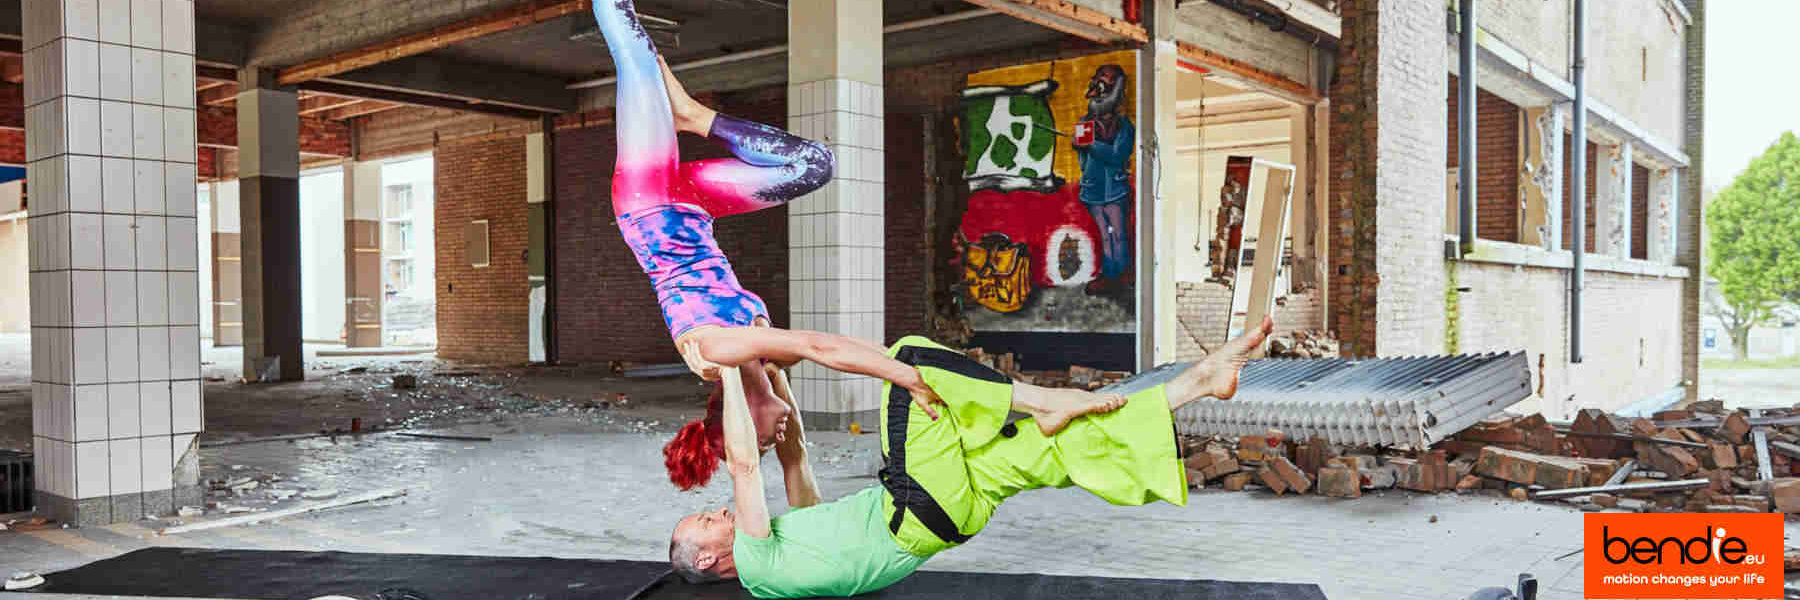 Acro yoga voor love birds. 2 people finding balance in an acrobatic pose.